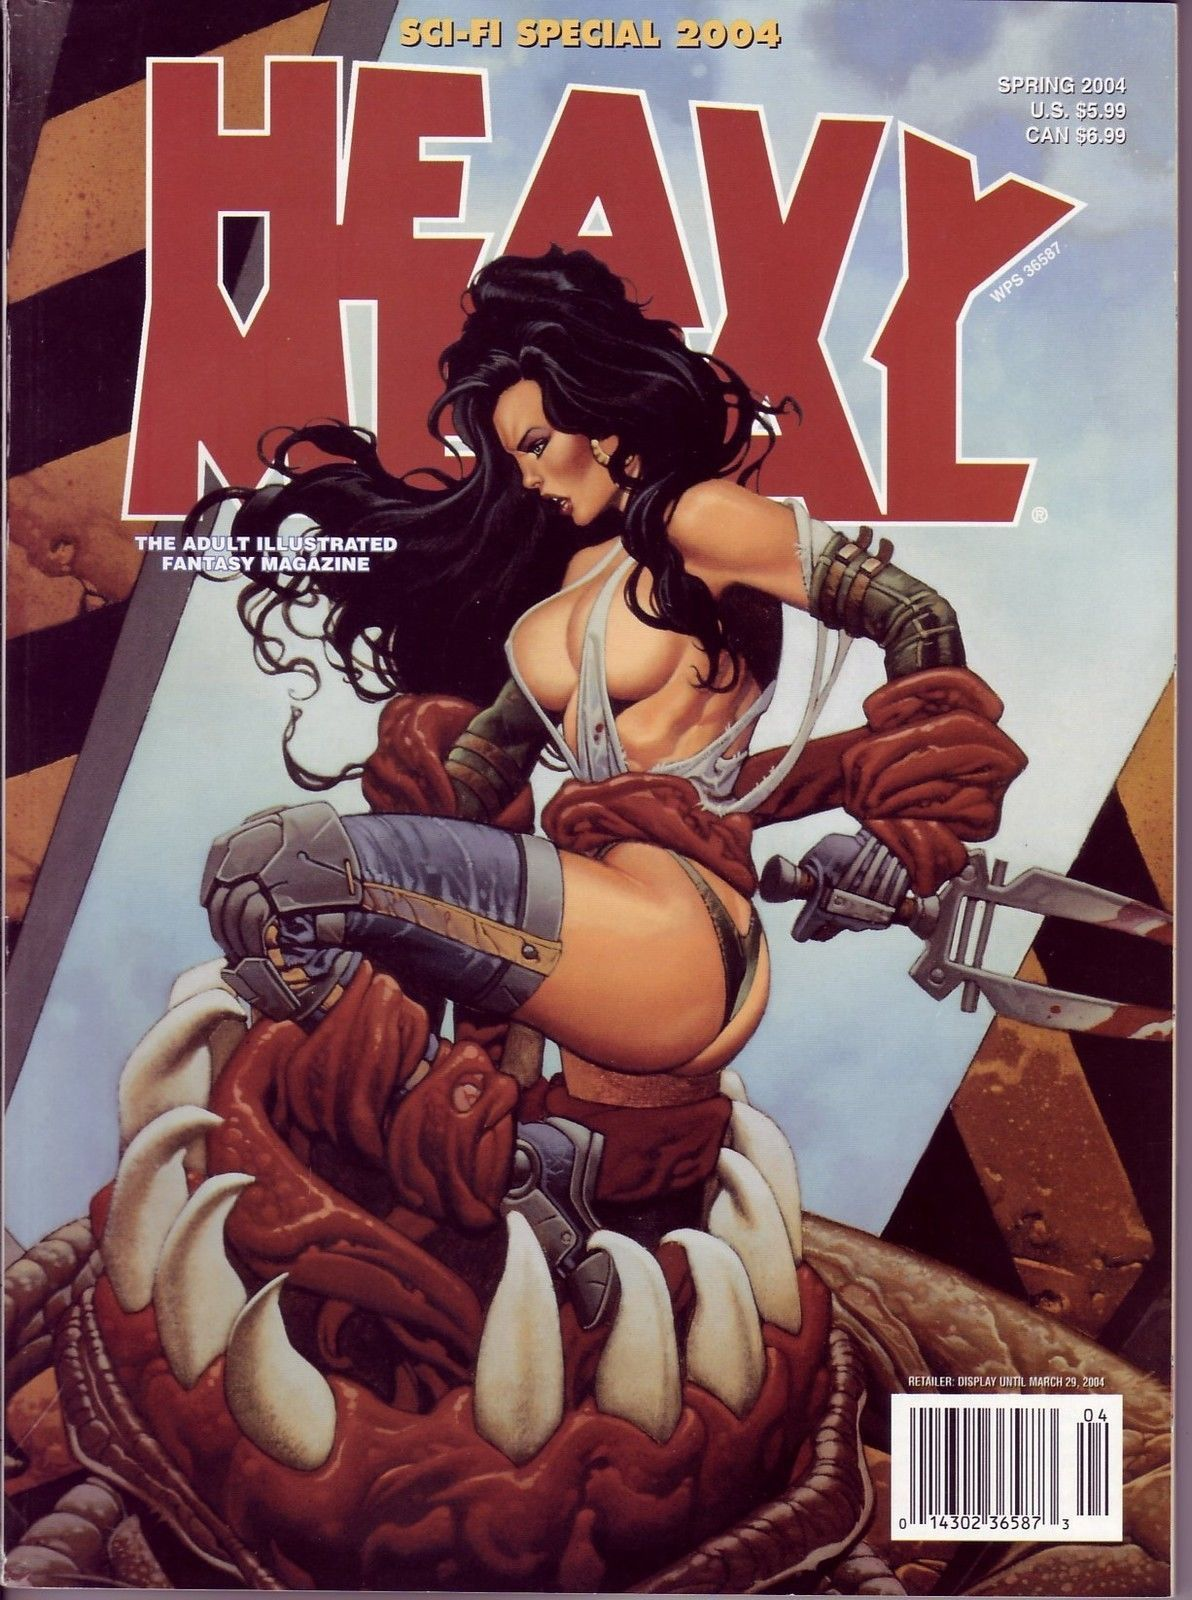 Showing xxx images for julie heavy metal xxx